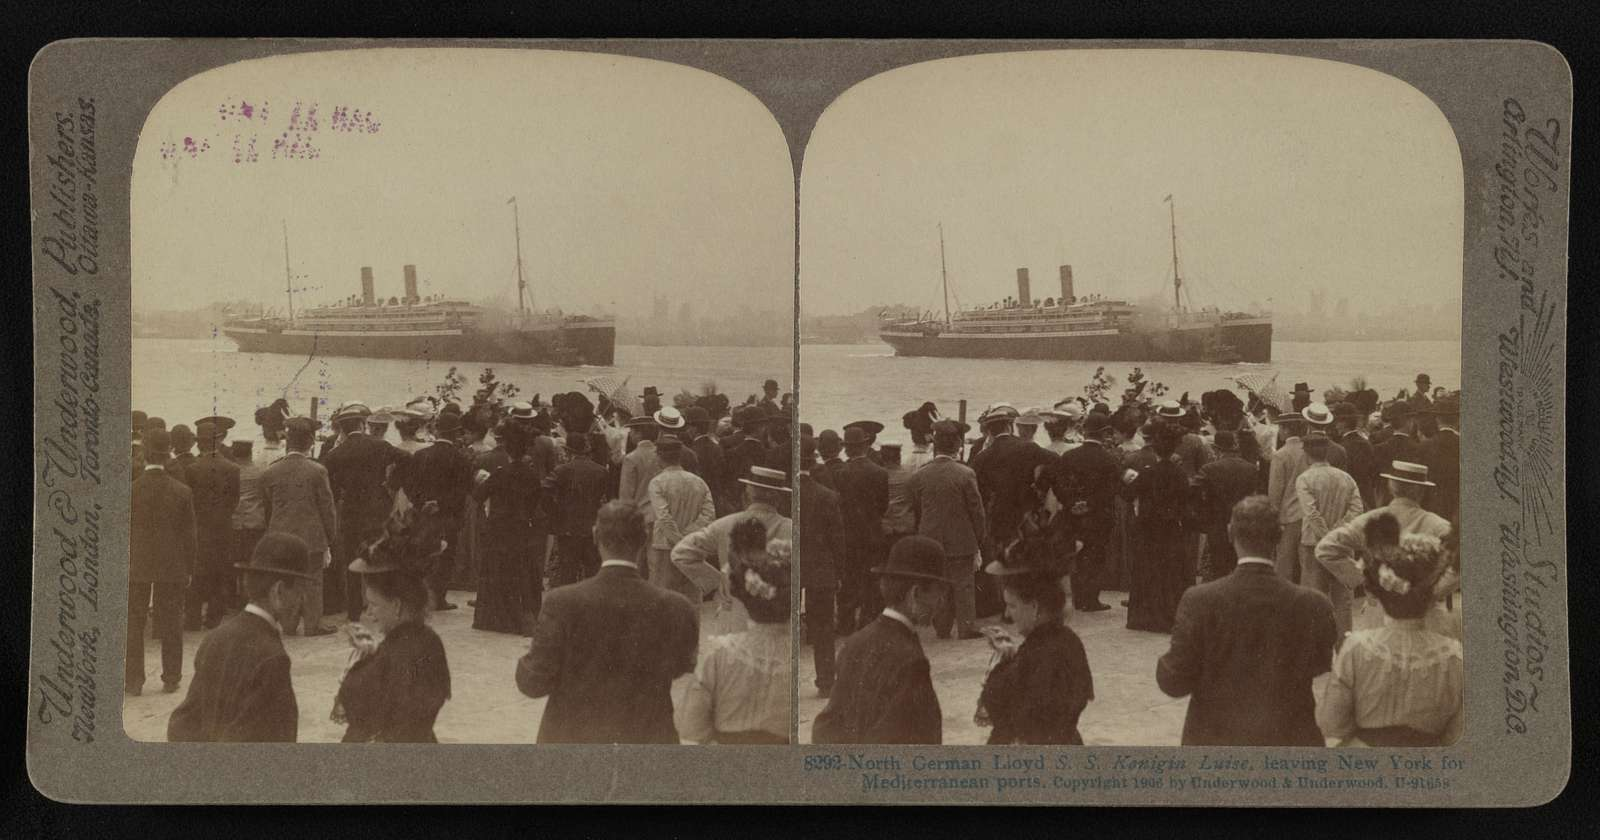 North German Lloyd S.S. Konigin Luise, leaving New York for Mediterranean ports